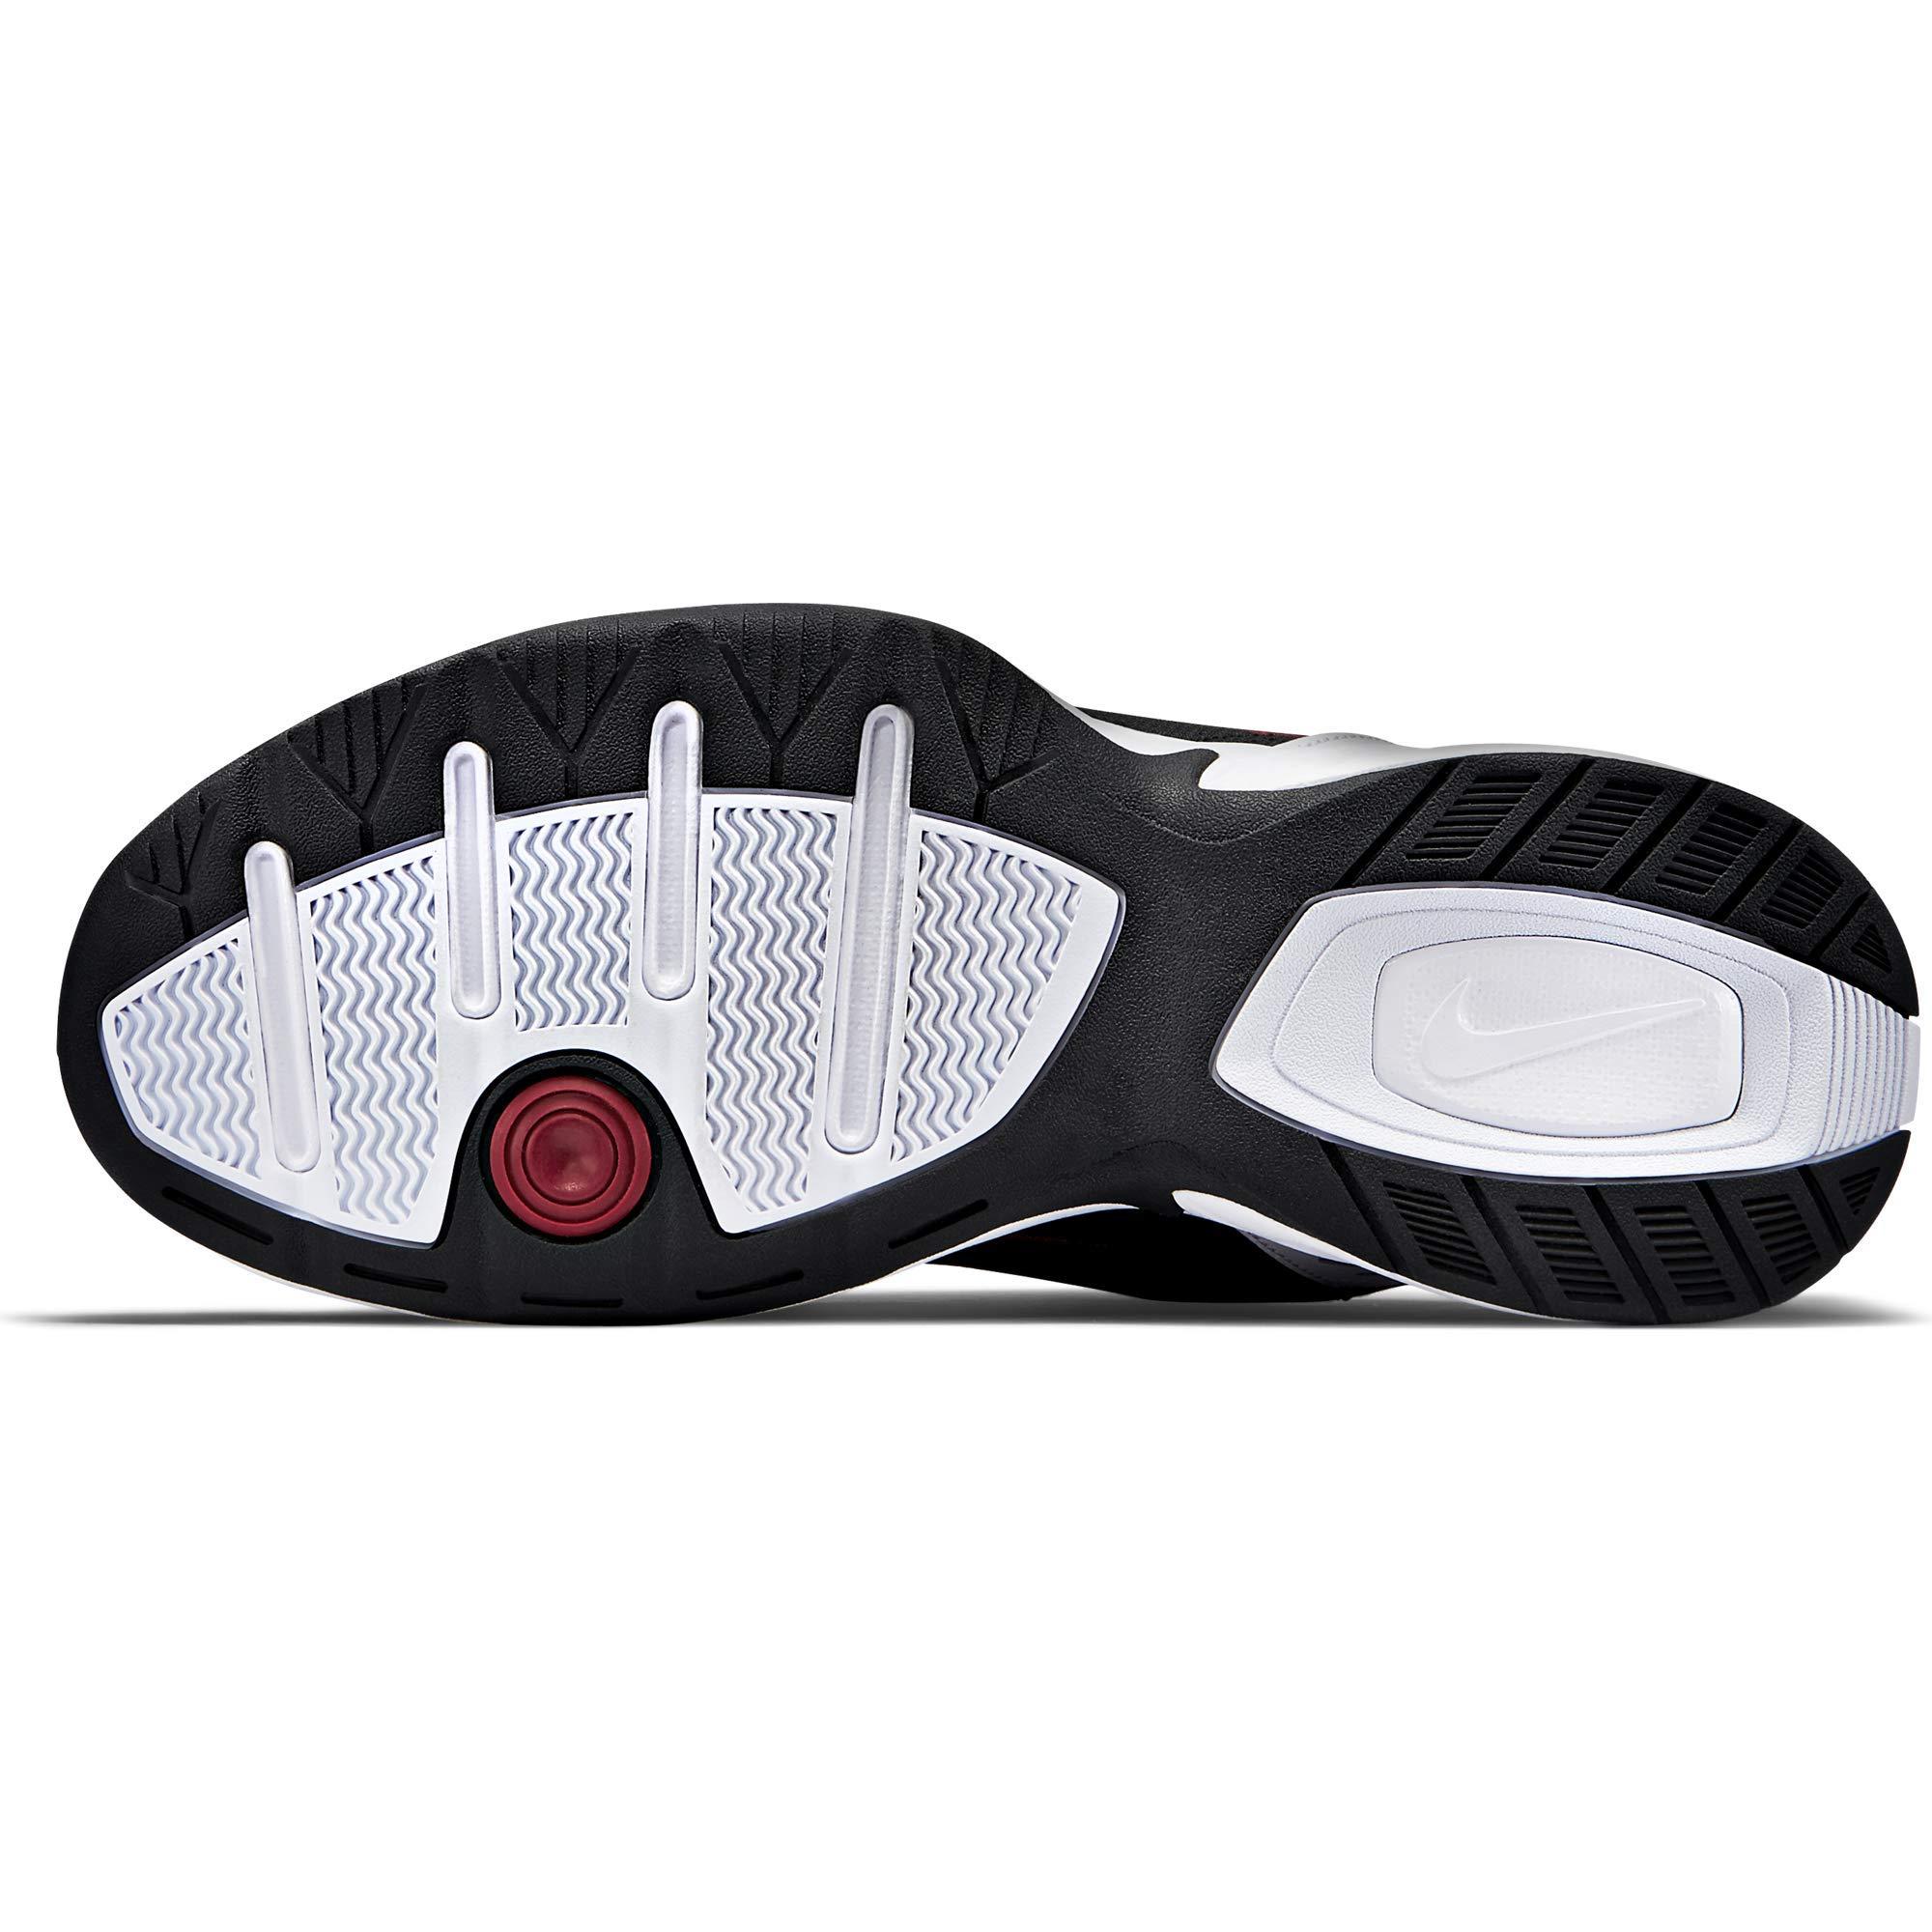 Nike Men's Air Monarch IV Cross Trainer, White/Black, 7.0 Regular US by Nike (Image #10)